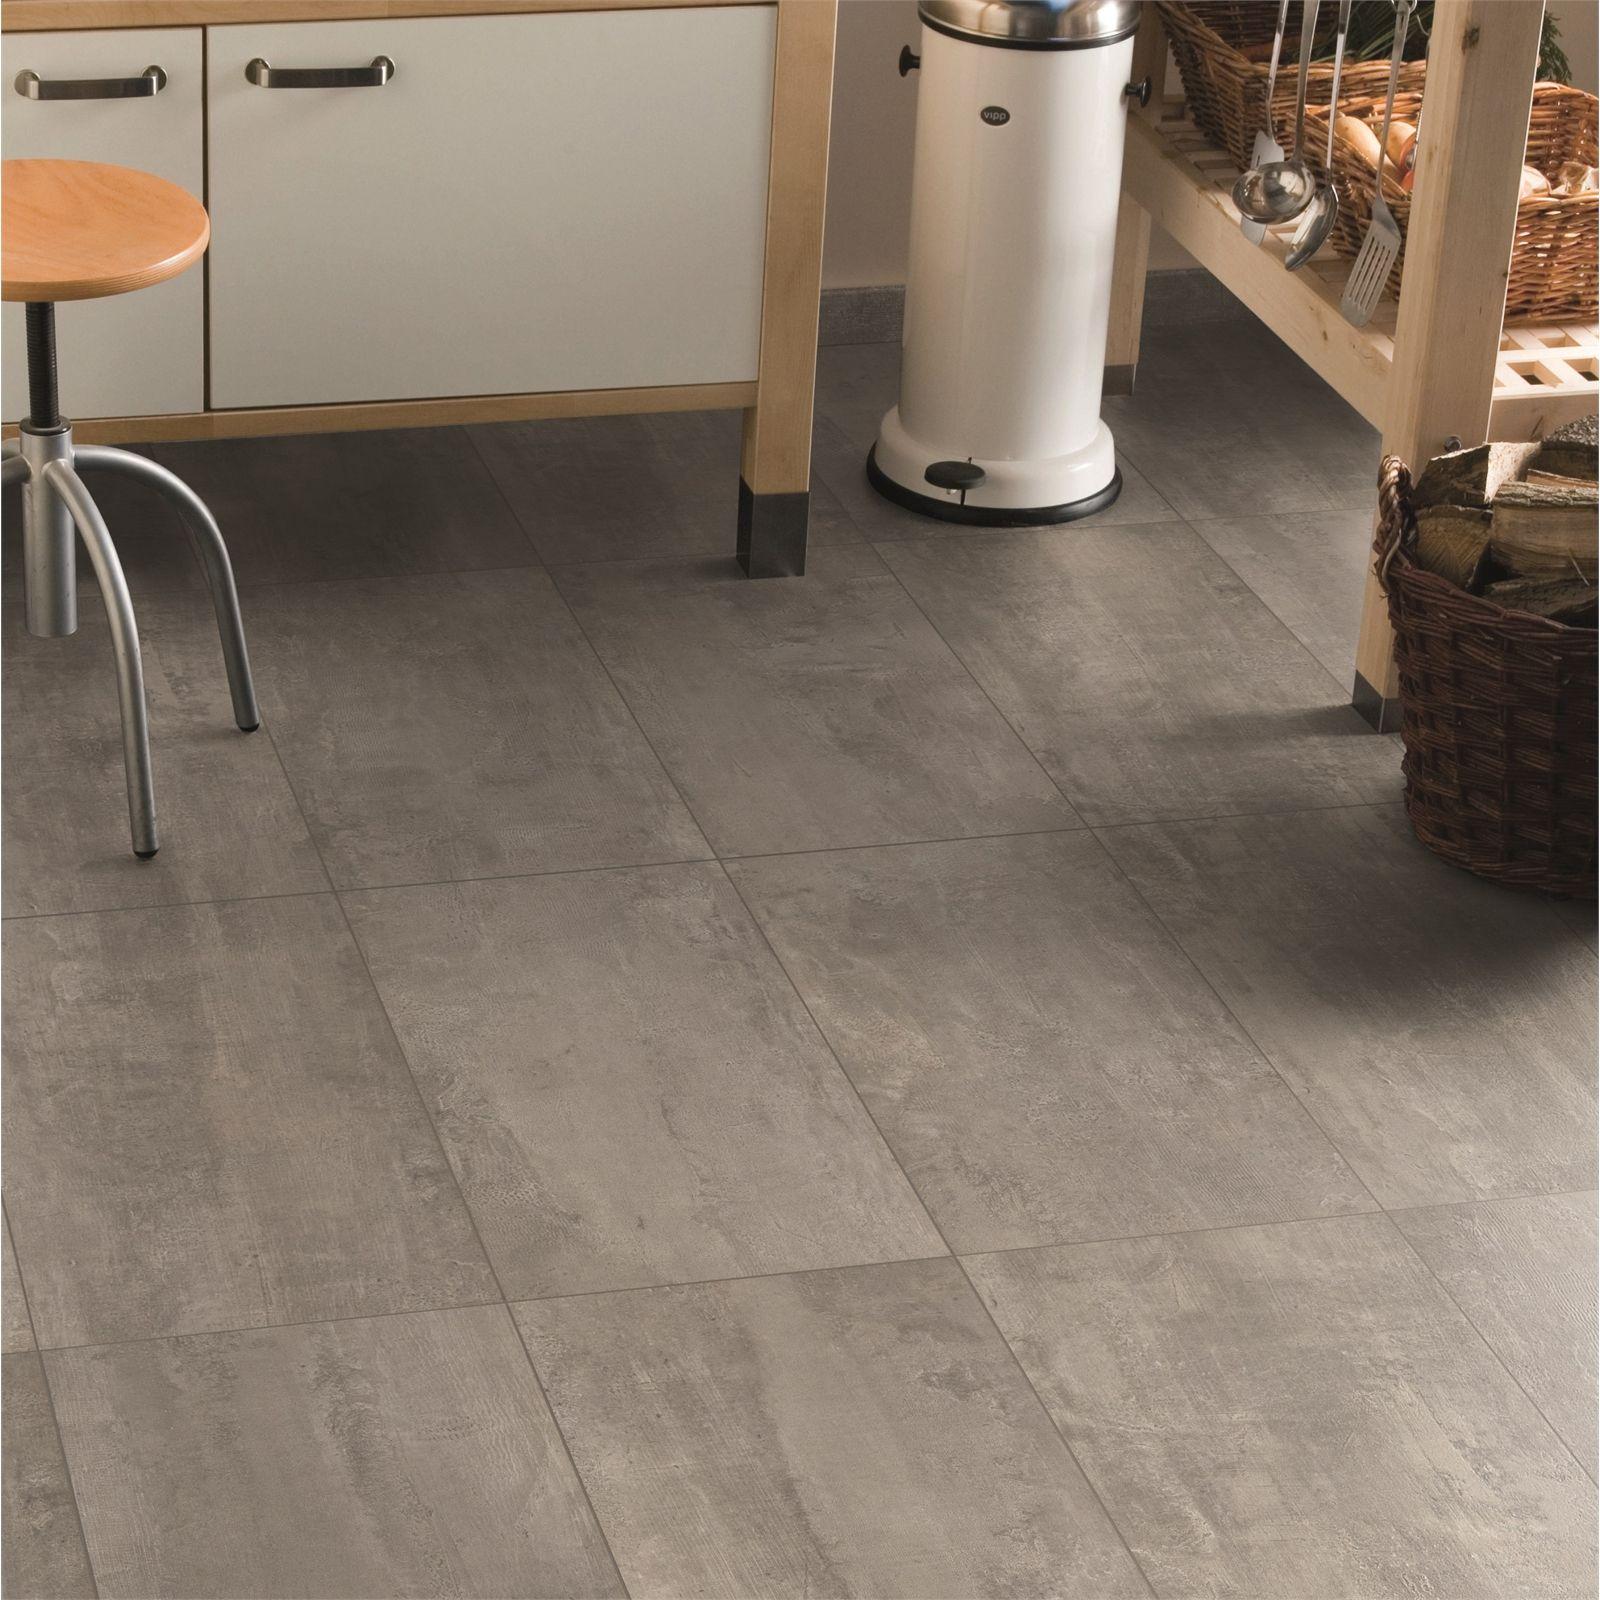 Concrete Tile Effect Laminate Flooring at Homebase.co.uk